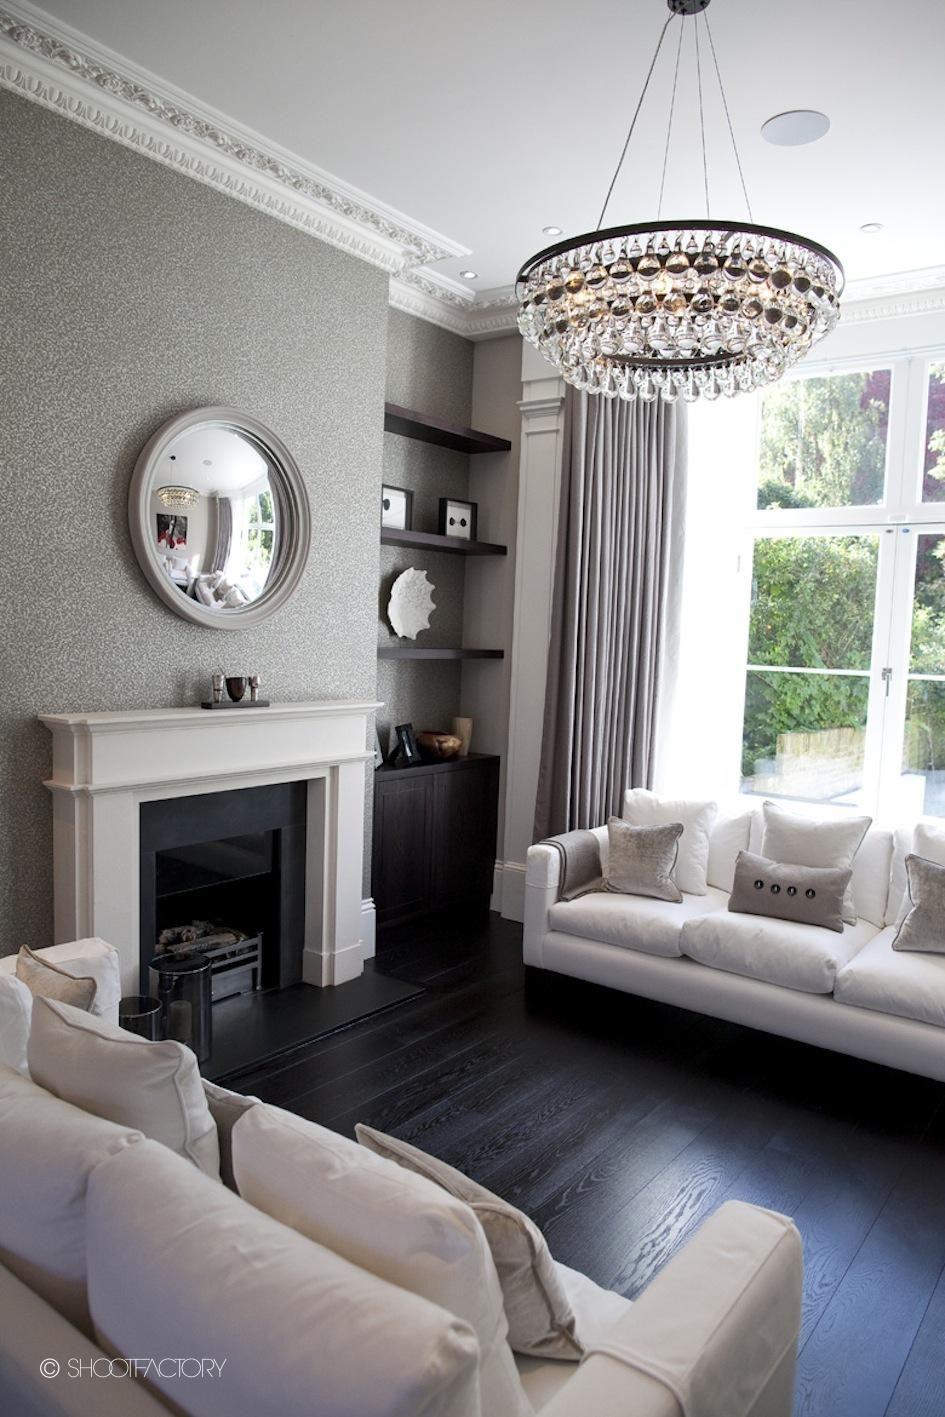 Victorian Room Design: Wallpaper, Round Mirror Living Room